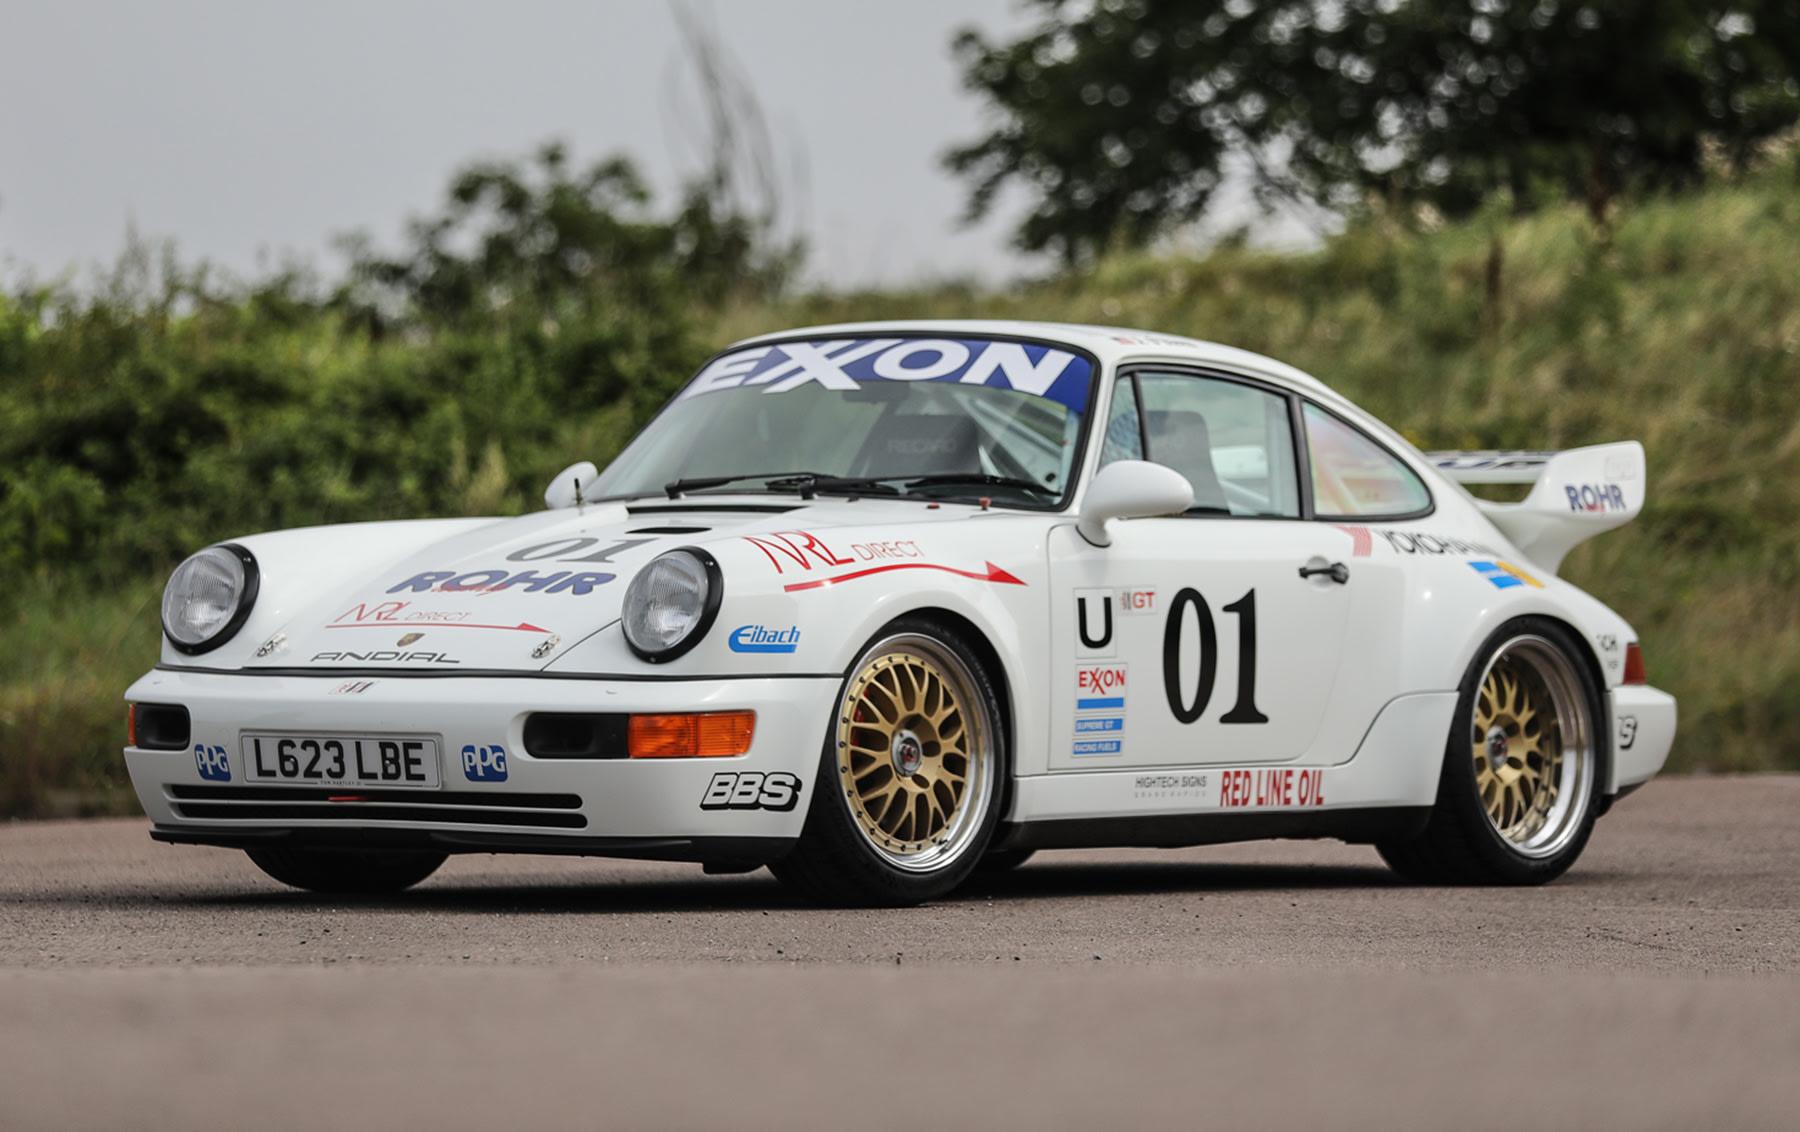 1993 Porsche 964 Carrera 3.8 RSR (2)